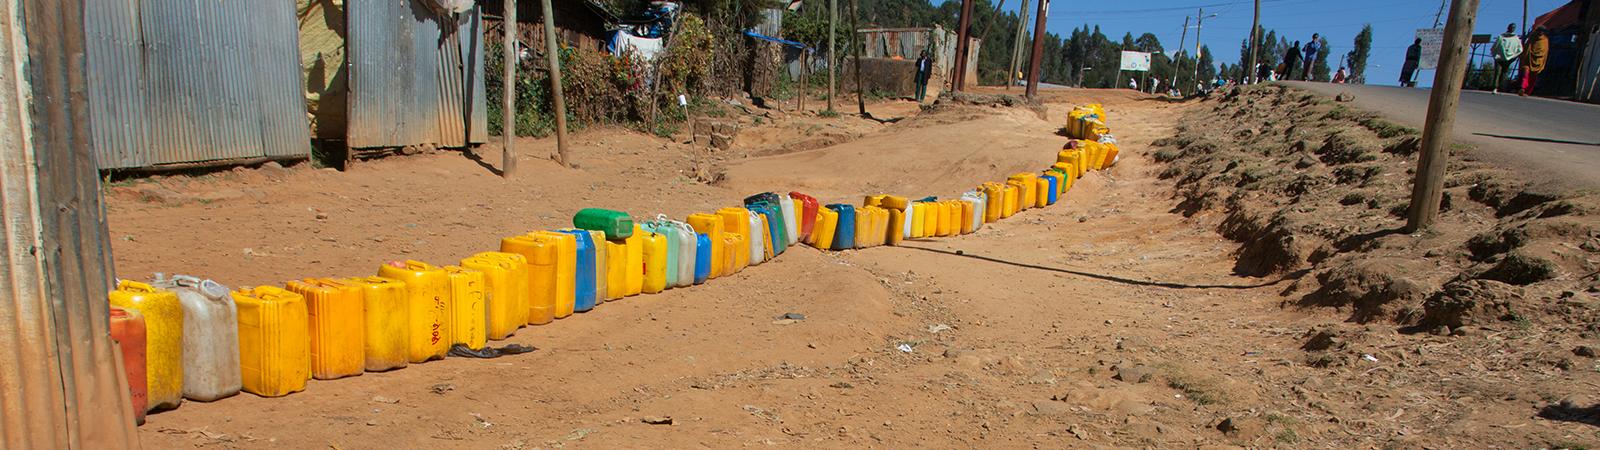 Waiting for water in Ethiopia © Aleksandr Hunta / Shutterstock